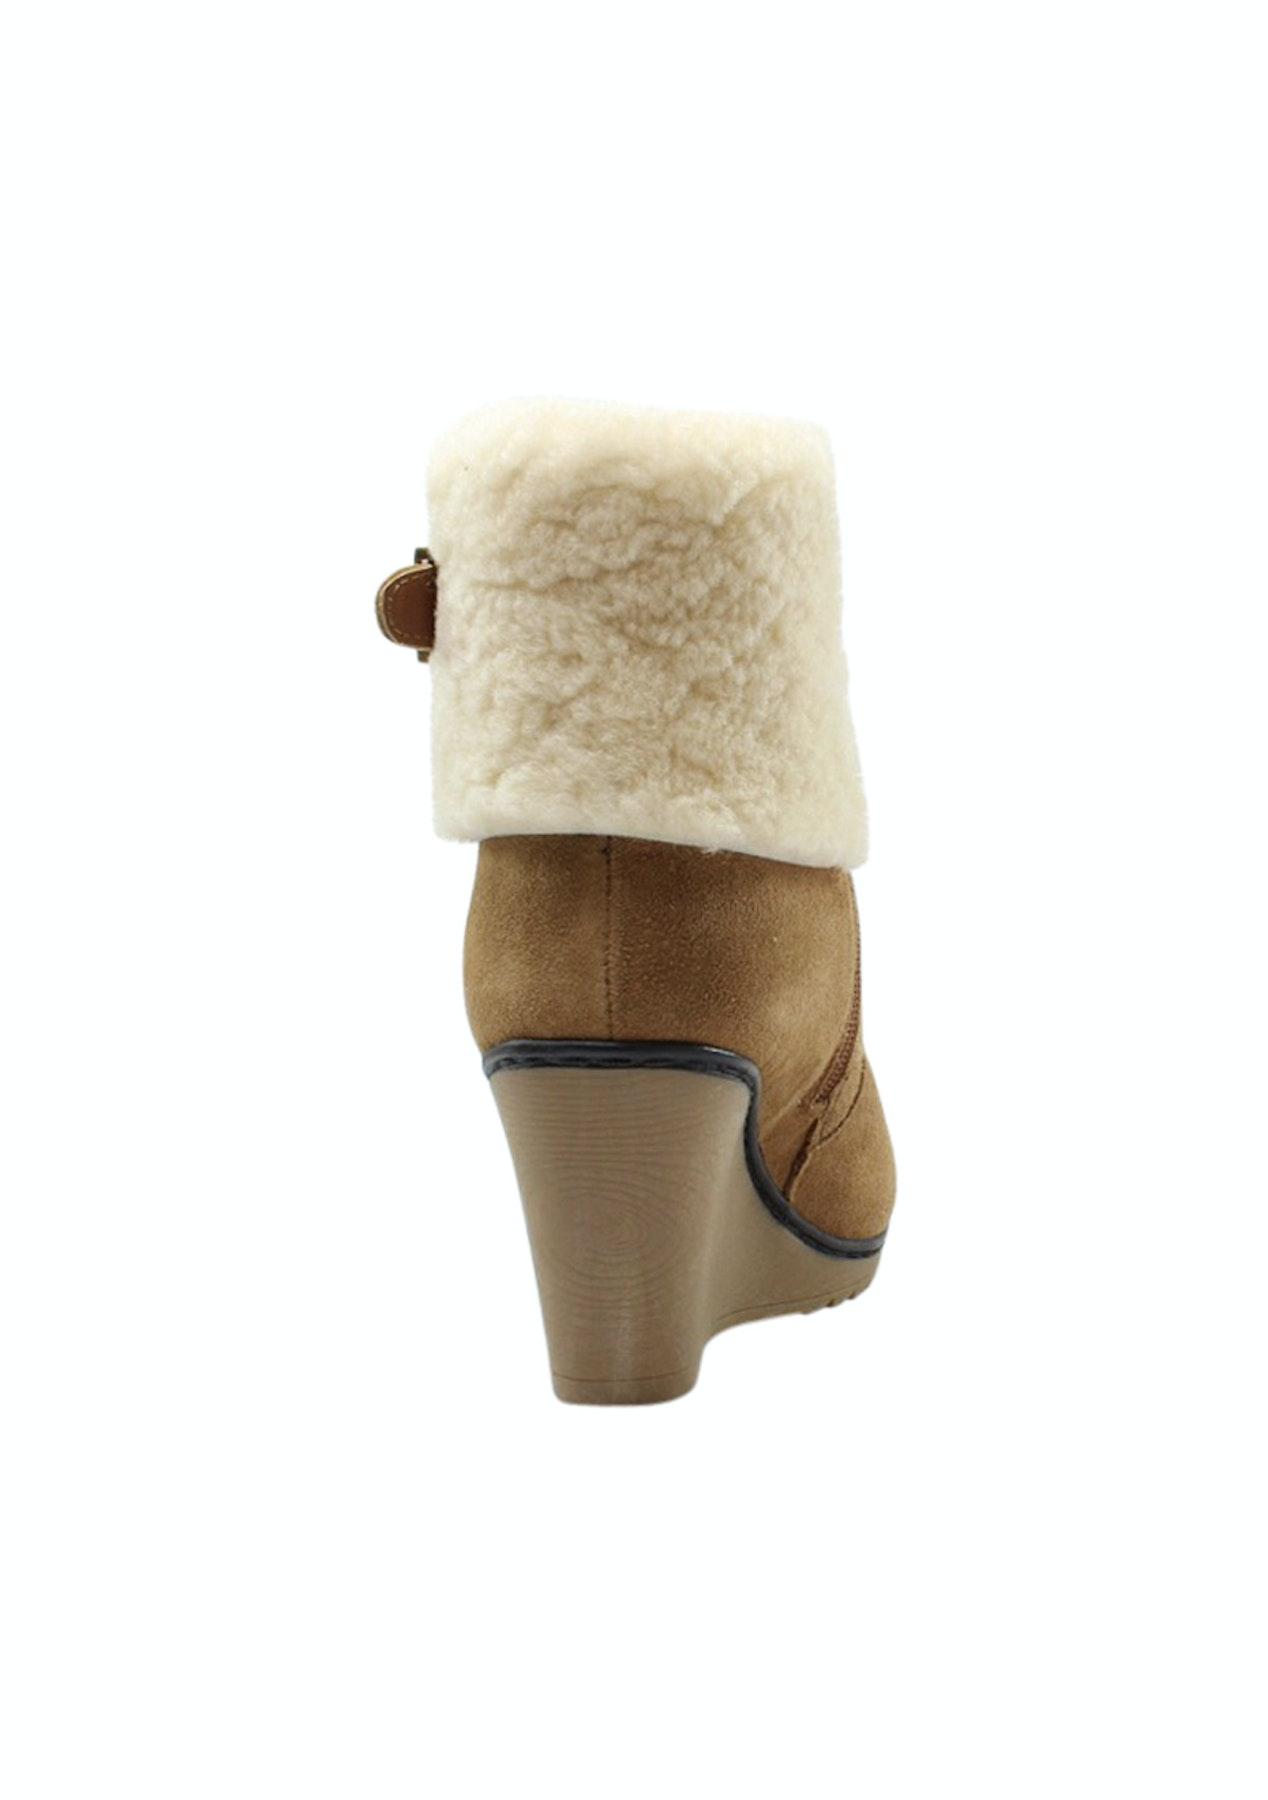 b7a4f43ed54 Auzland Ugg Ladies Leather Fashion Wedge Boot Stml0417 Chestnut